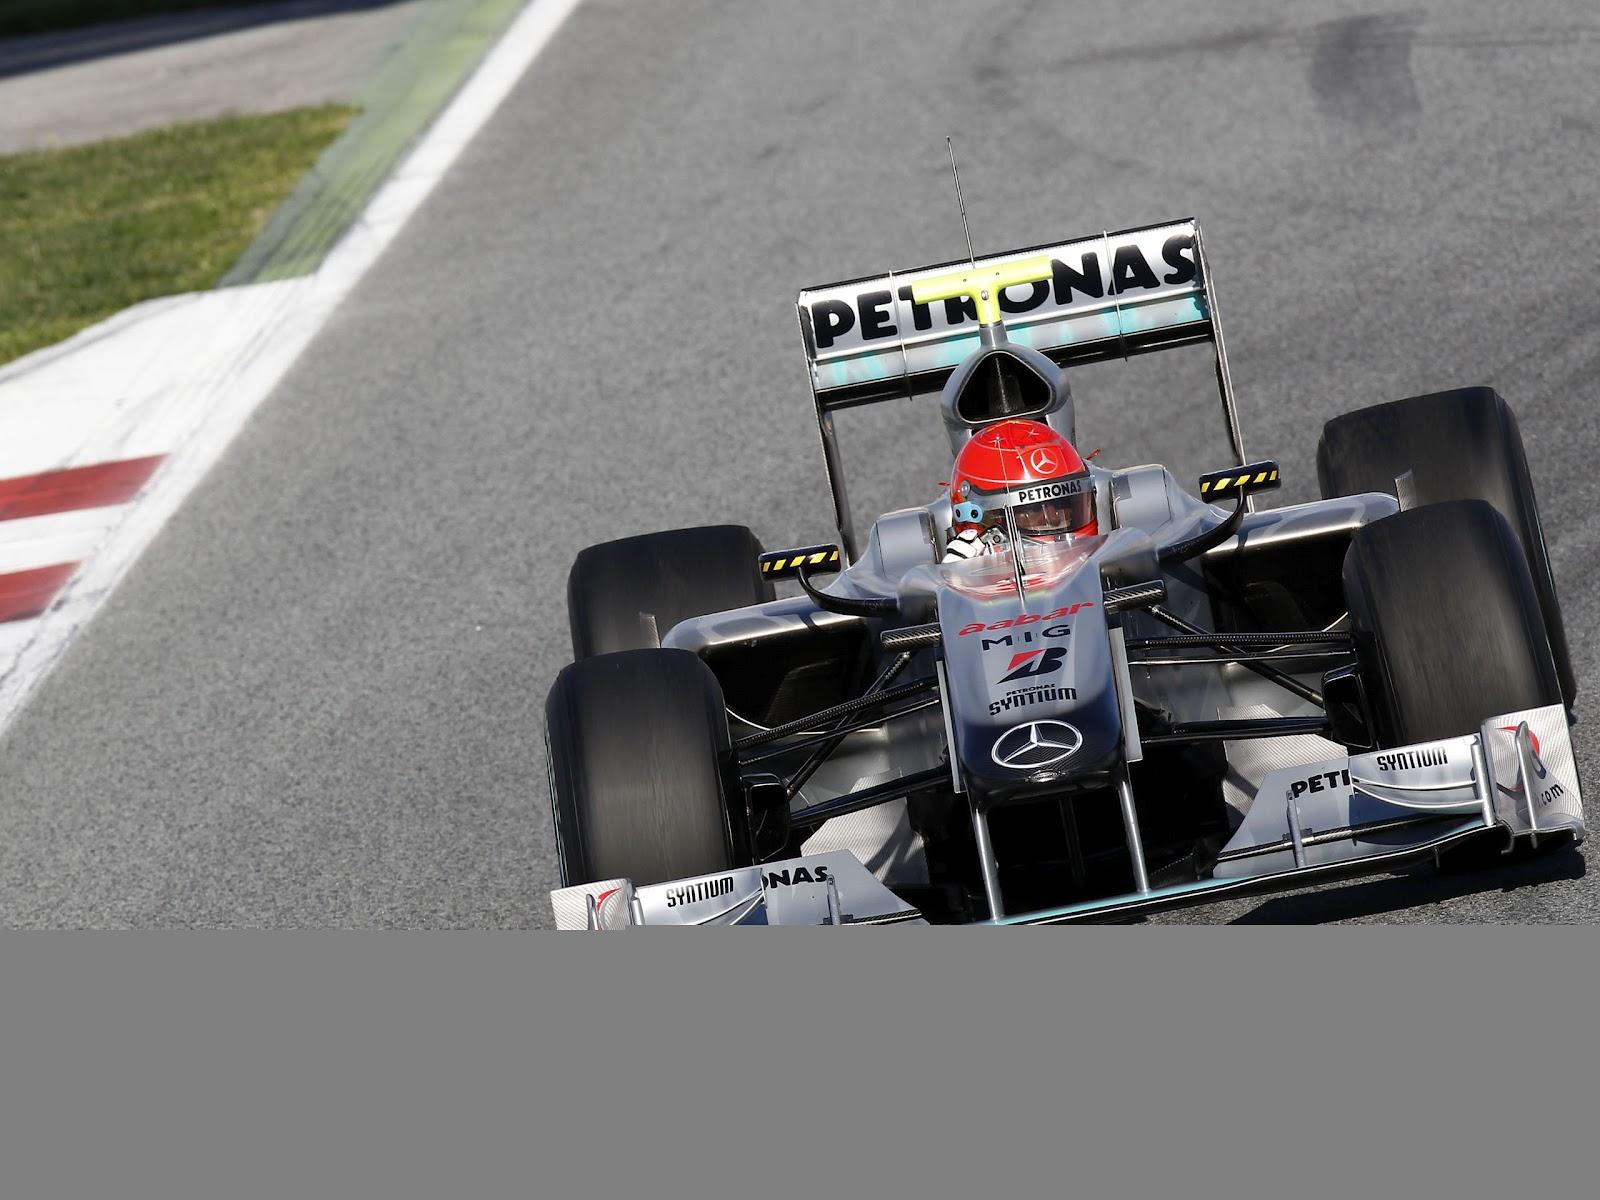 F1 Hd Extreme Sports: HD Sport Wallpapers: Formula 1 F1